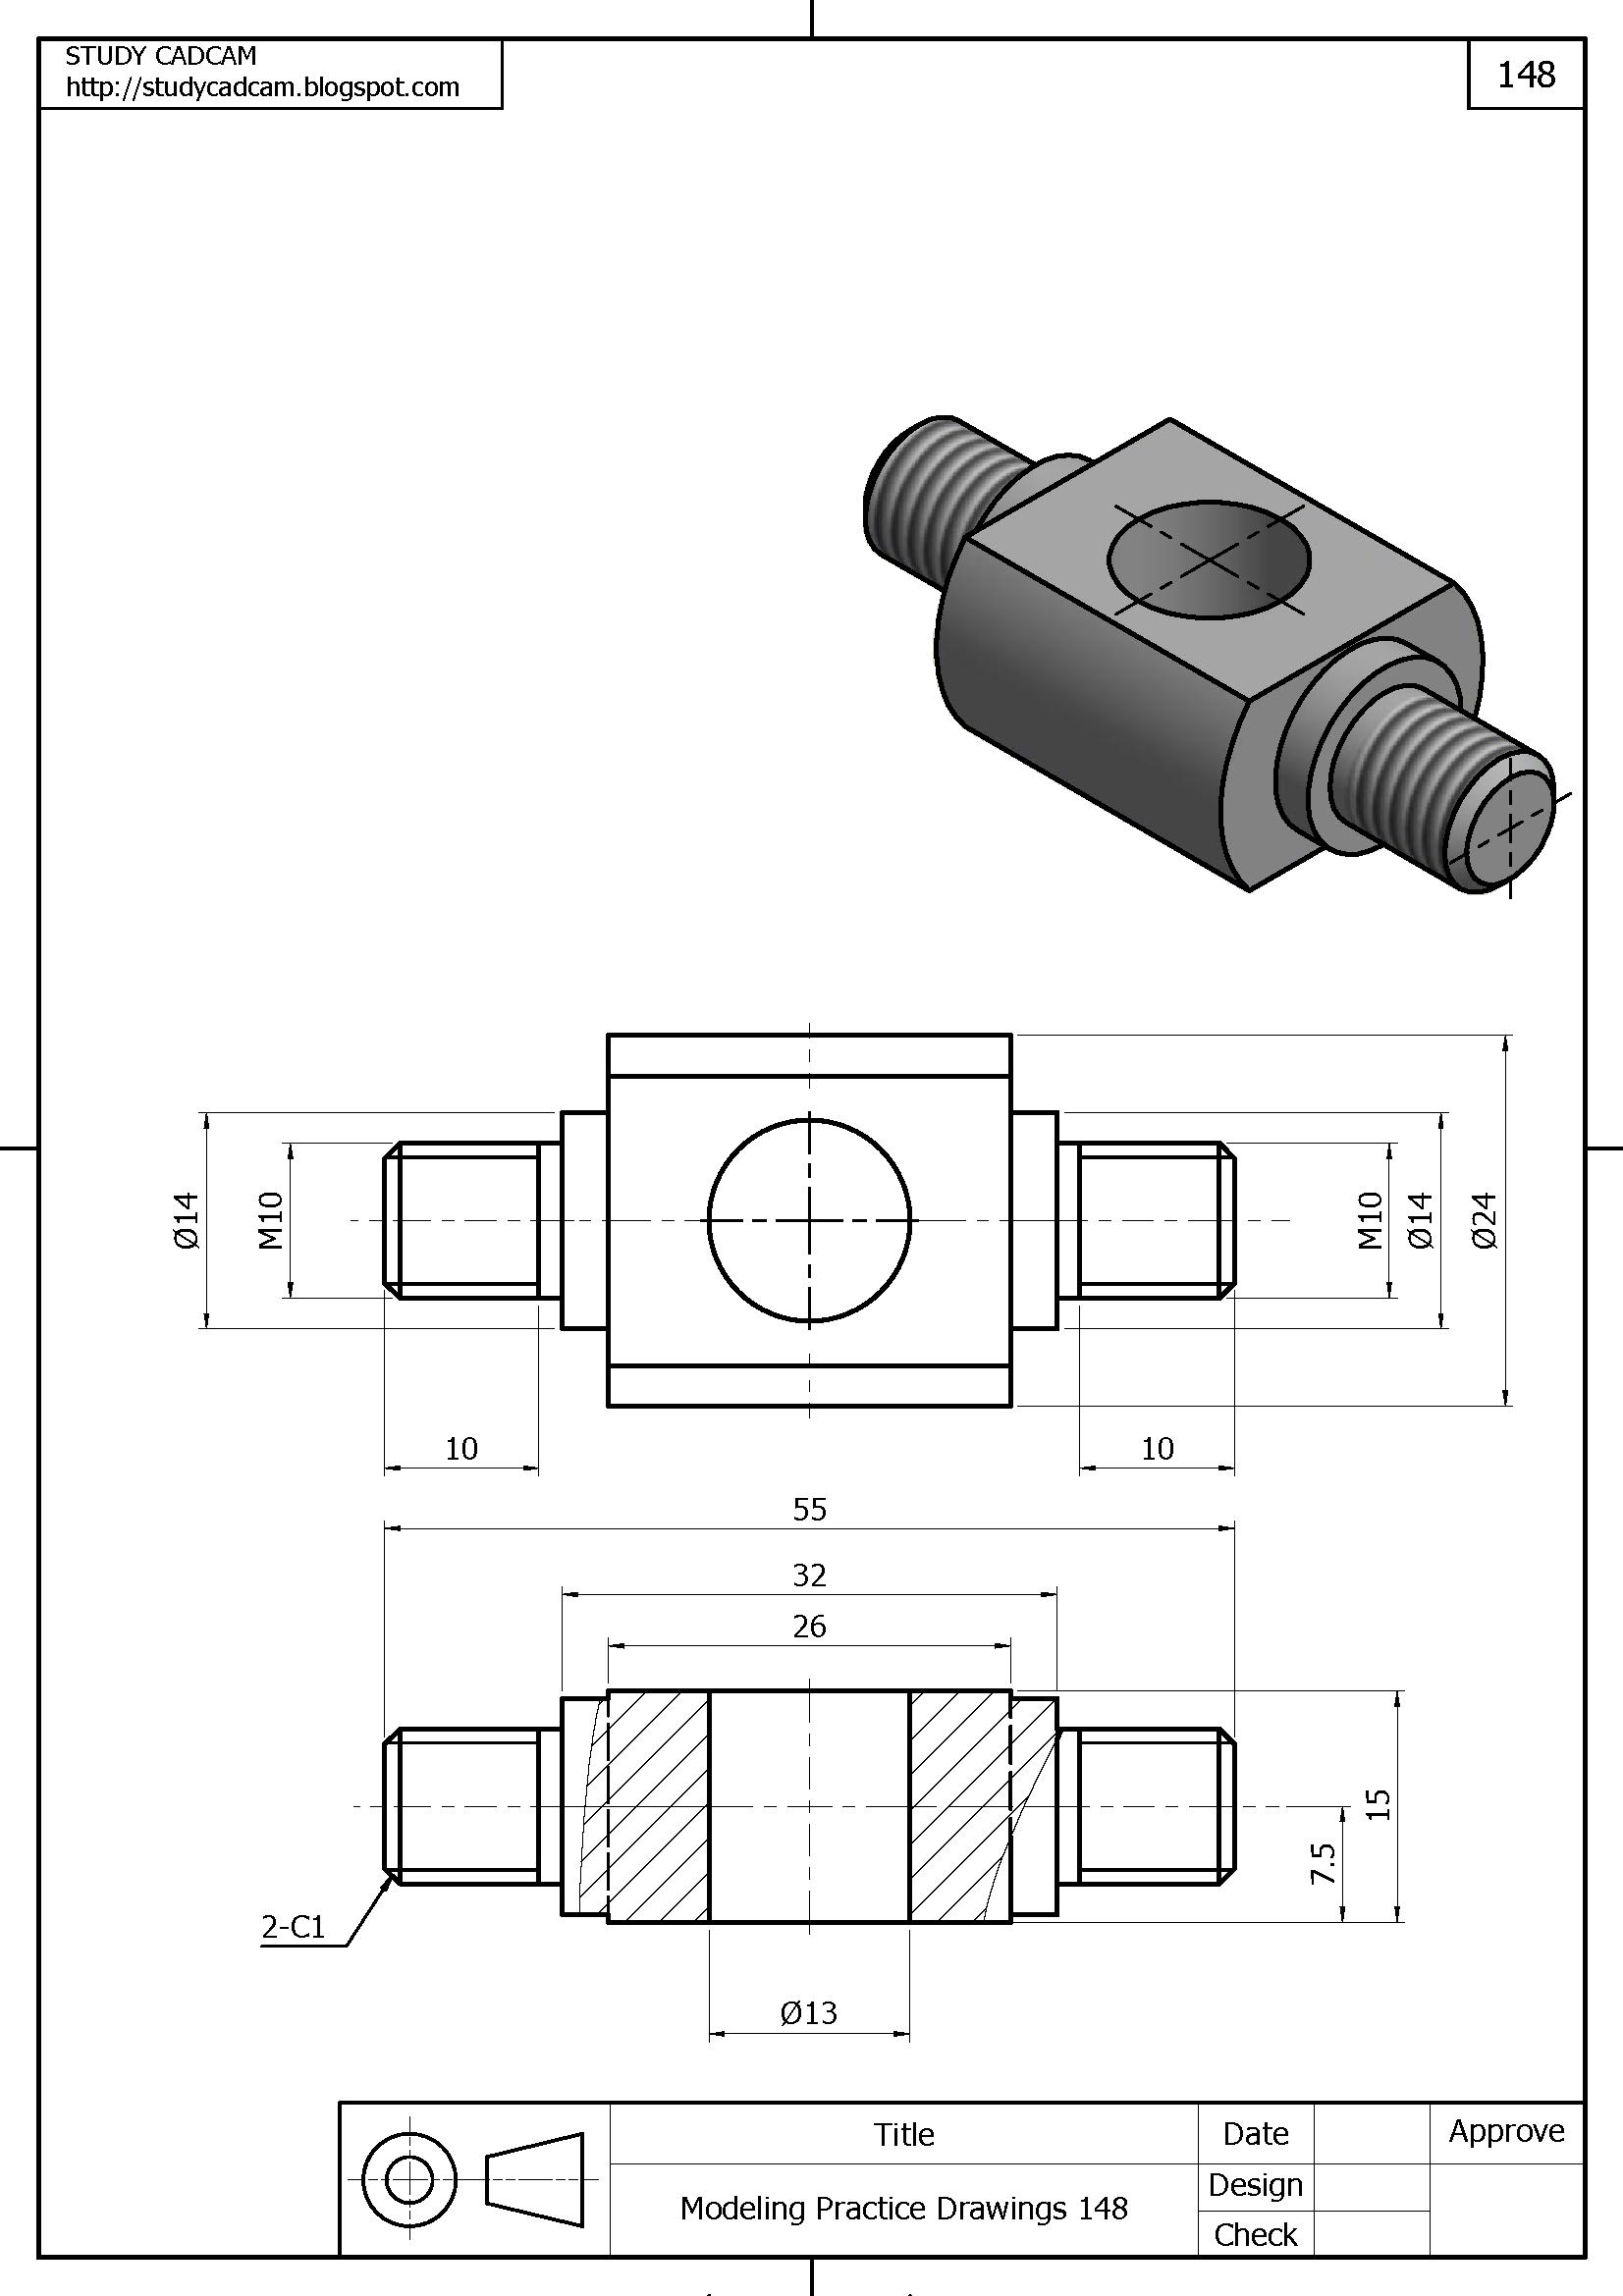 pin de  u0627 u0644 u0623 u0635 u0647 u0628  u0639 u0644 u064a en dessin industriel en 2019